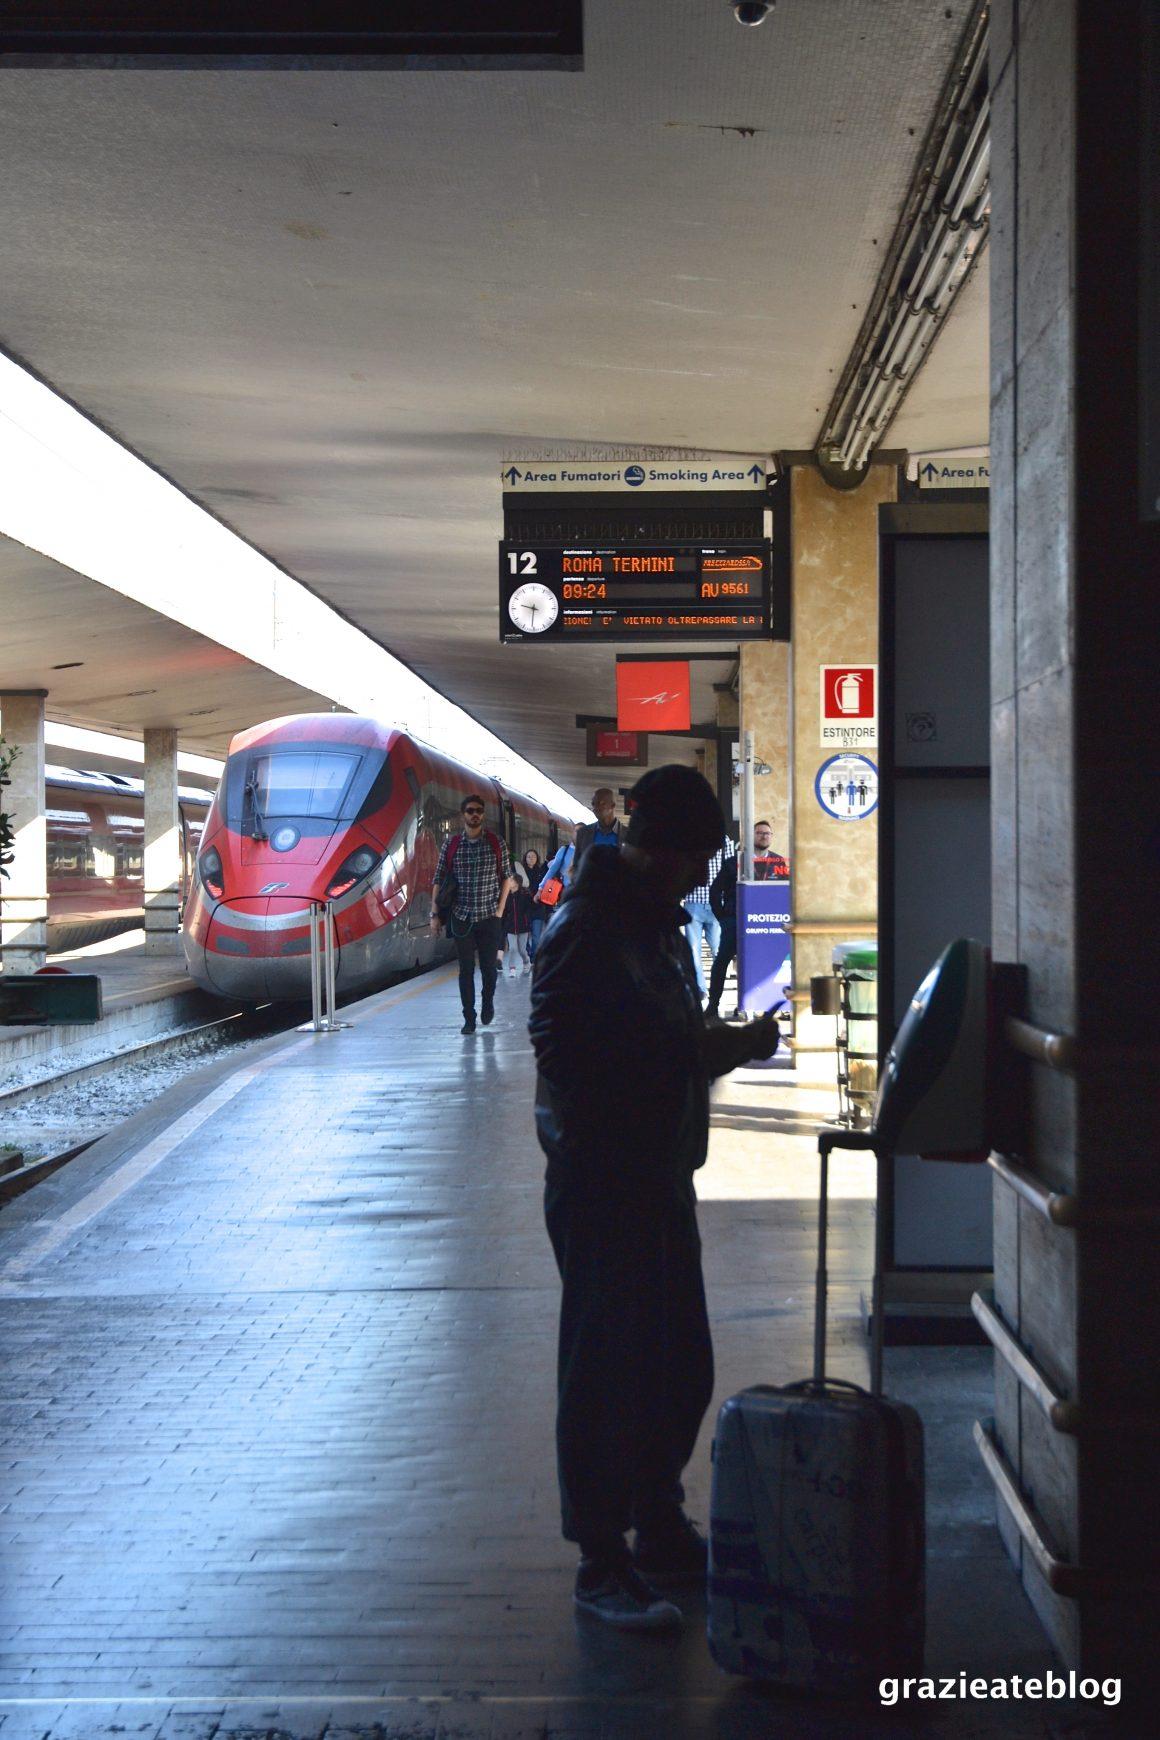 viajar-de-trem